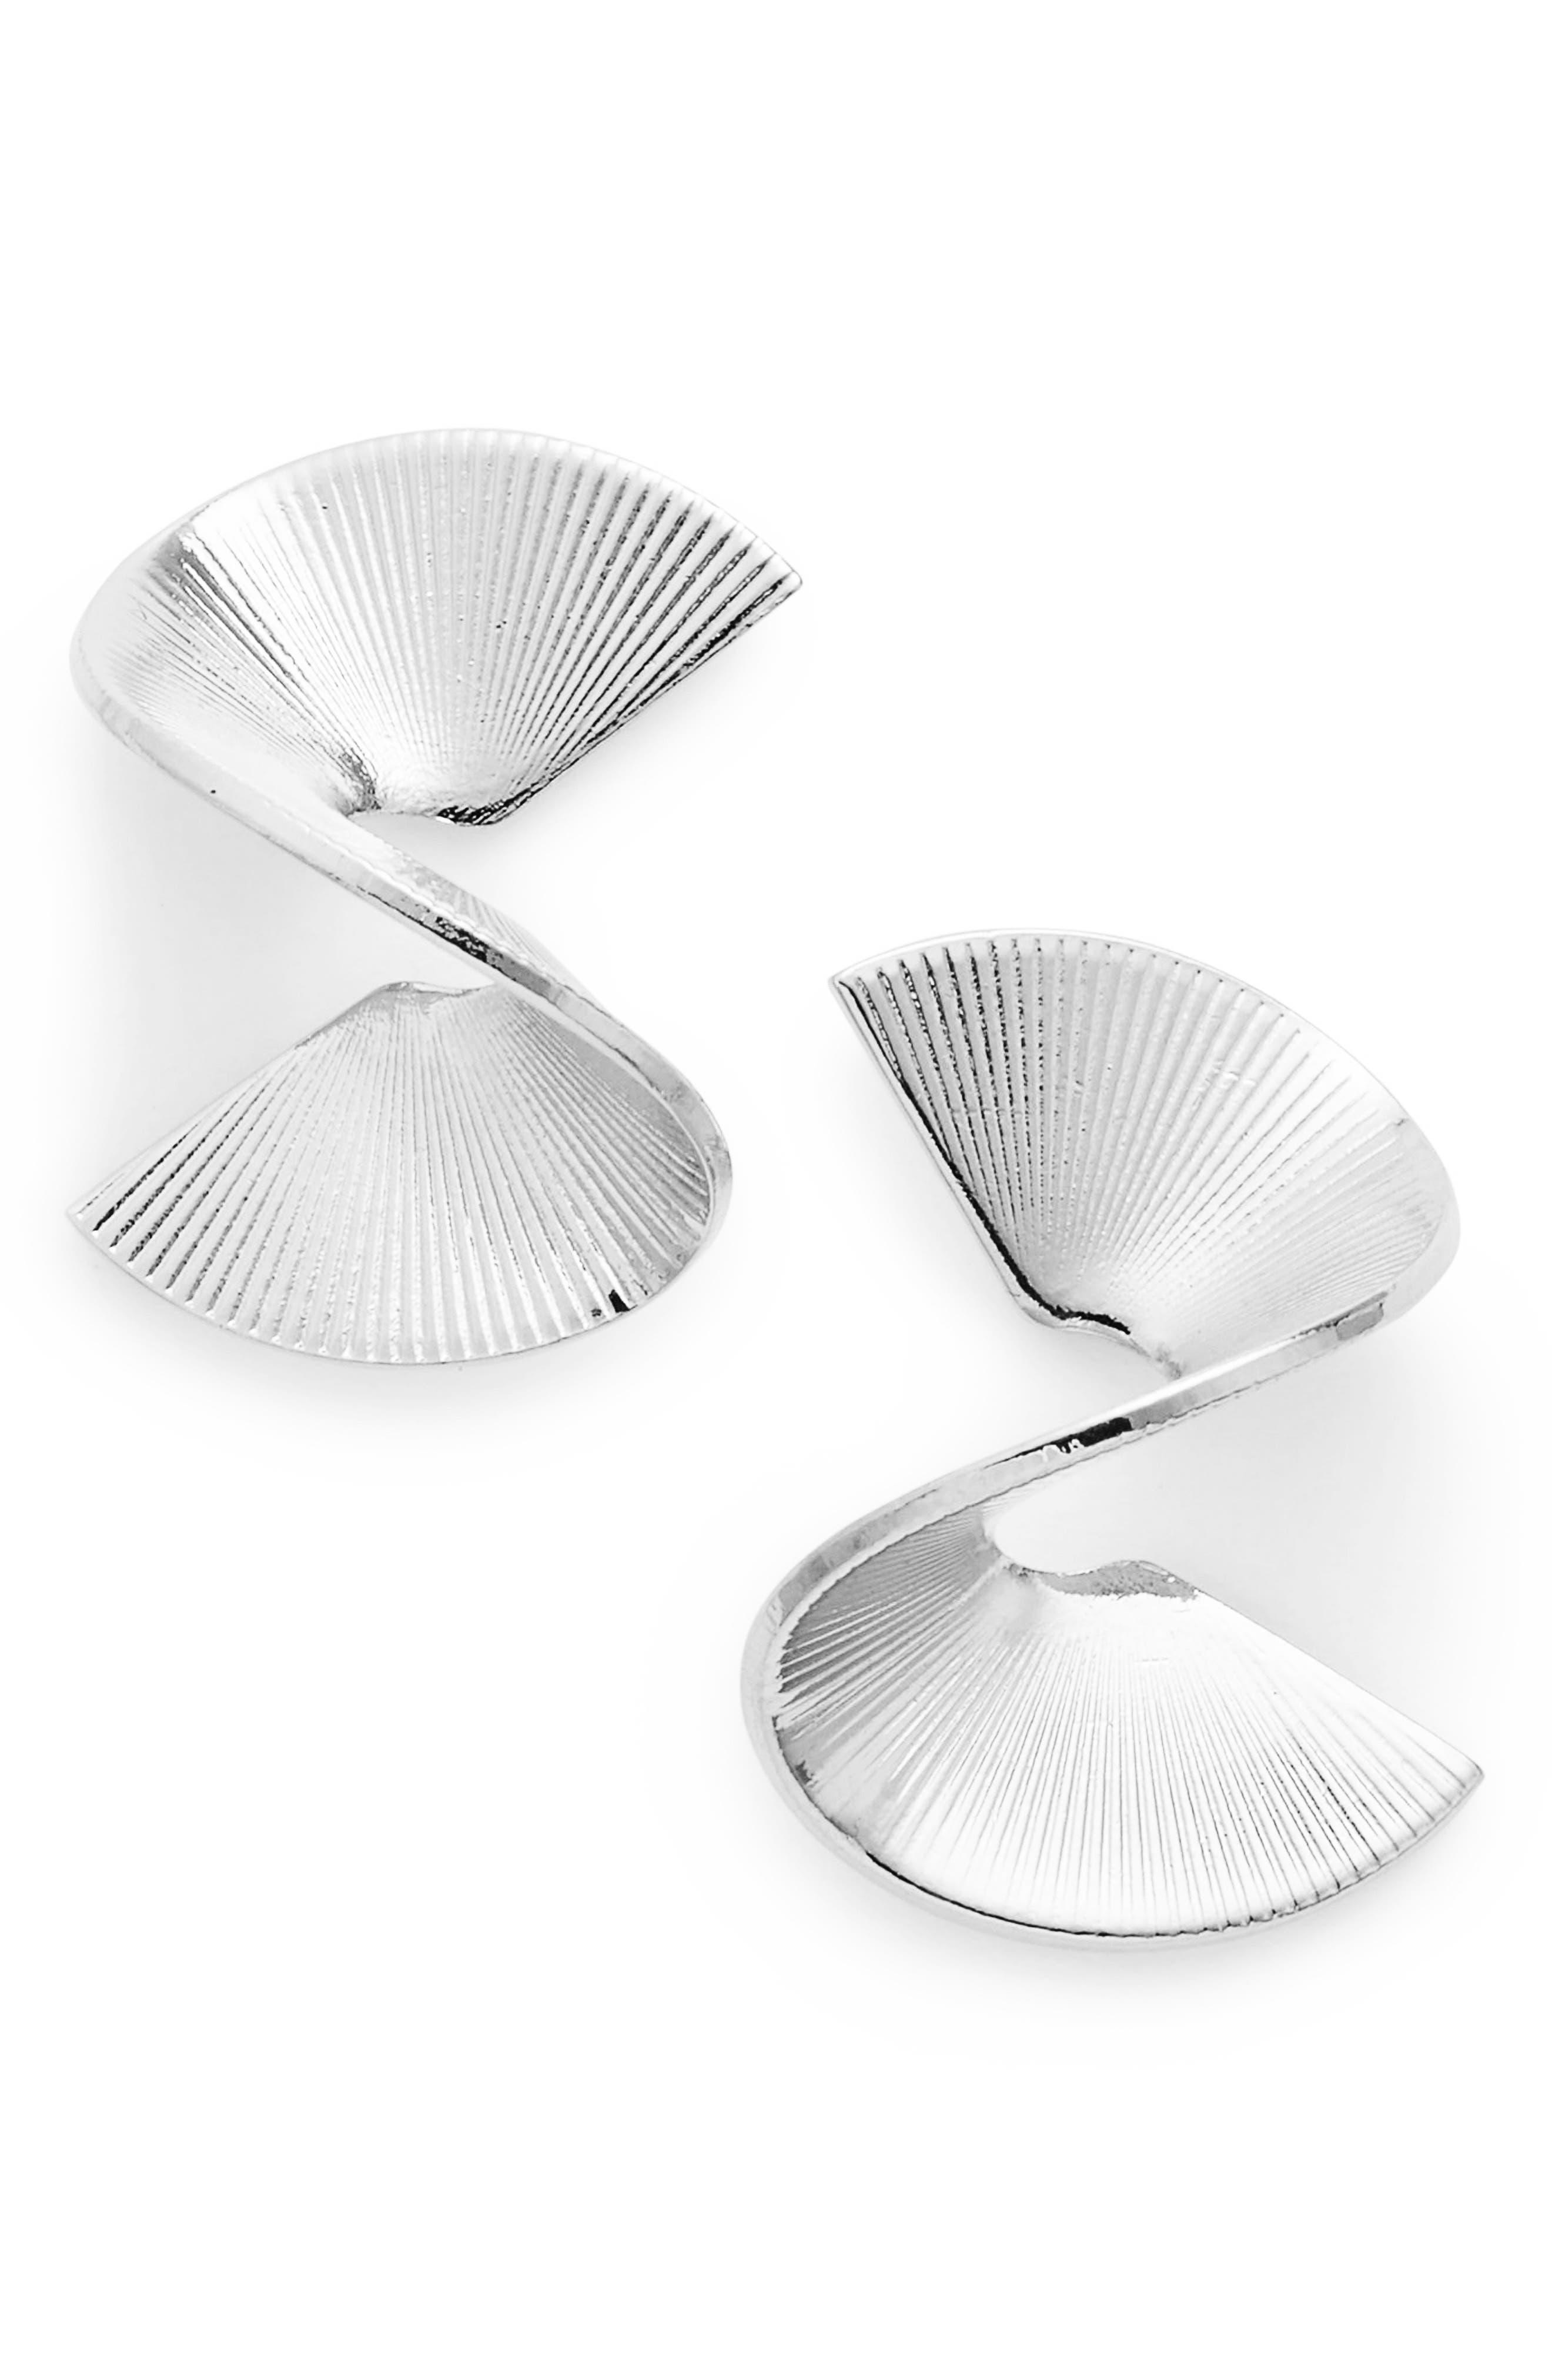 Solarwave Mini Stud Earrings,                             Main thumbnail 1, color,                             SILVER